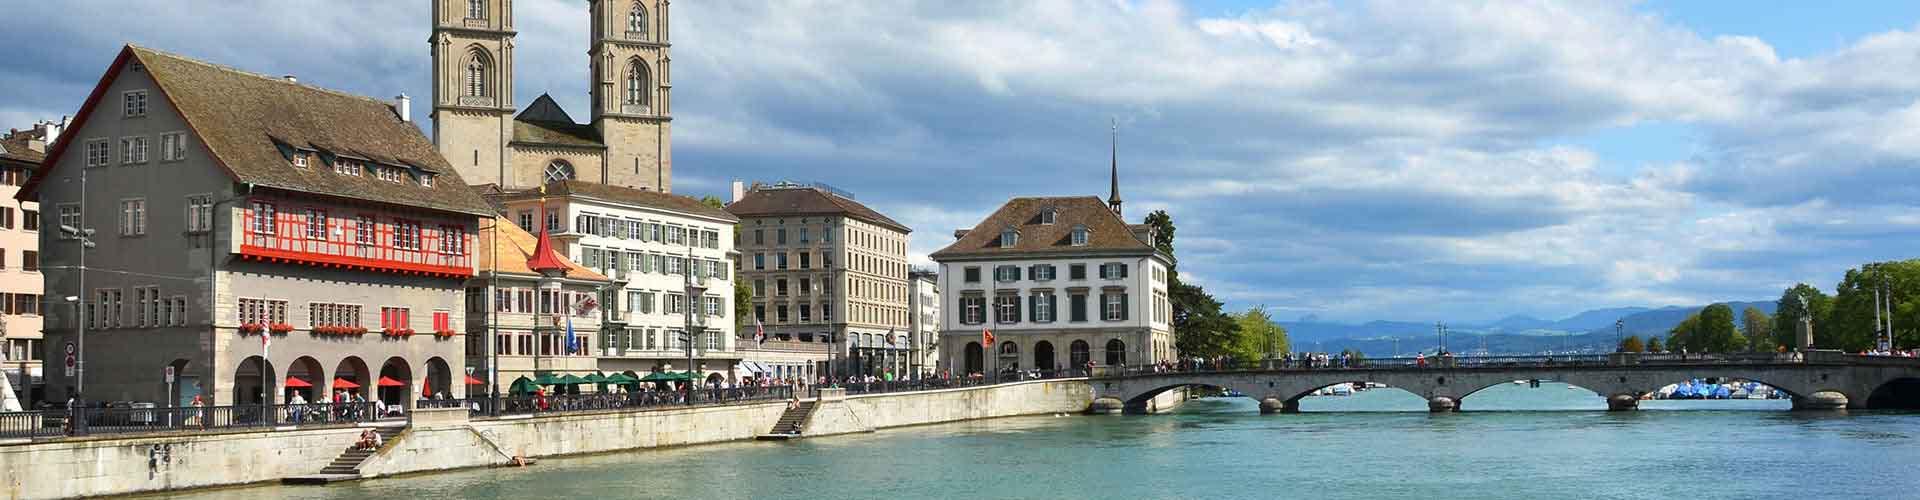 Zurich – Huoneistot kohteessa Zurich. Zurich -karttoja, valokuvia ja arvosteluja kaikista Zurich -huoneistoista.